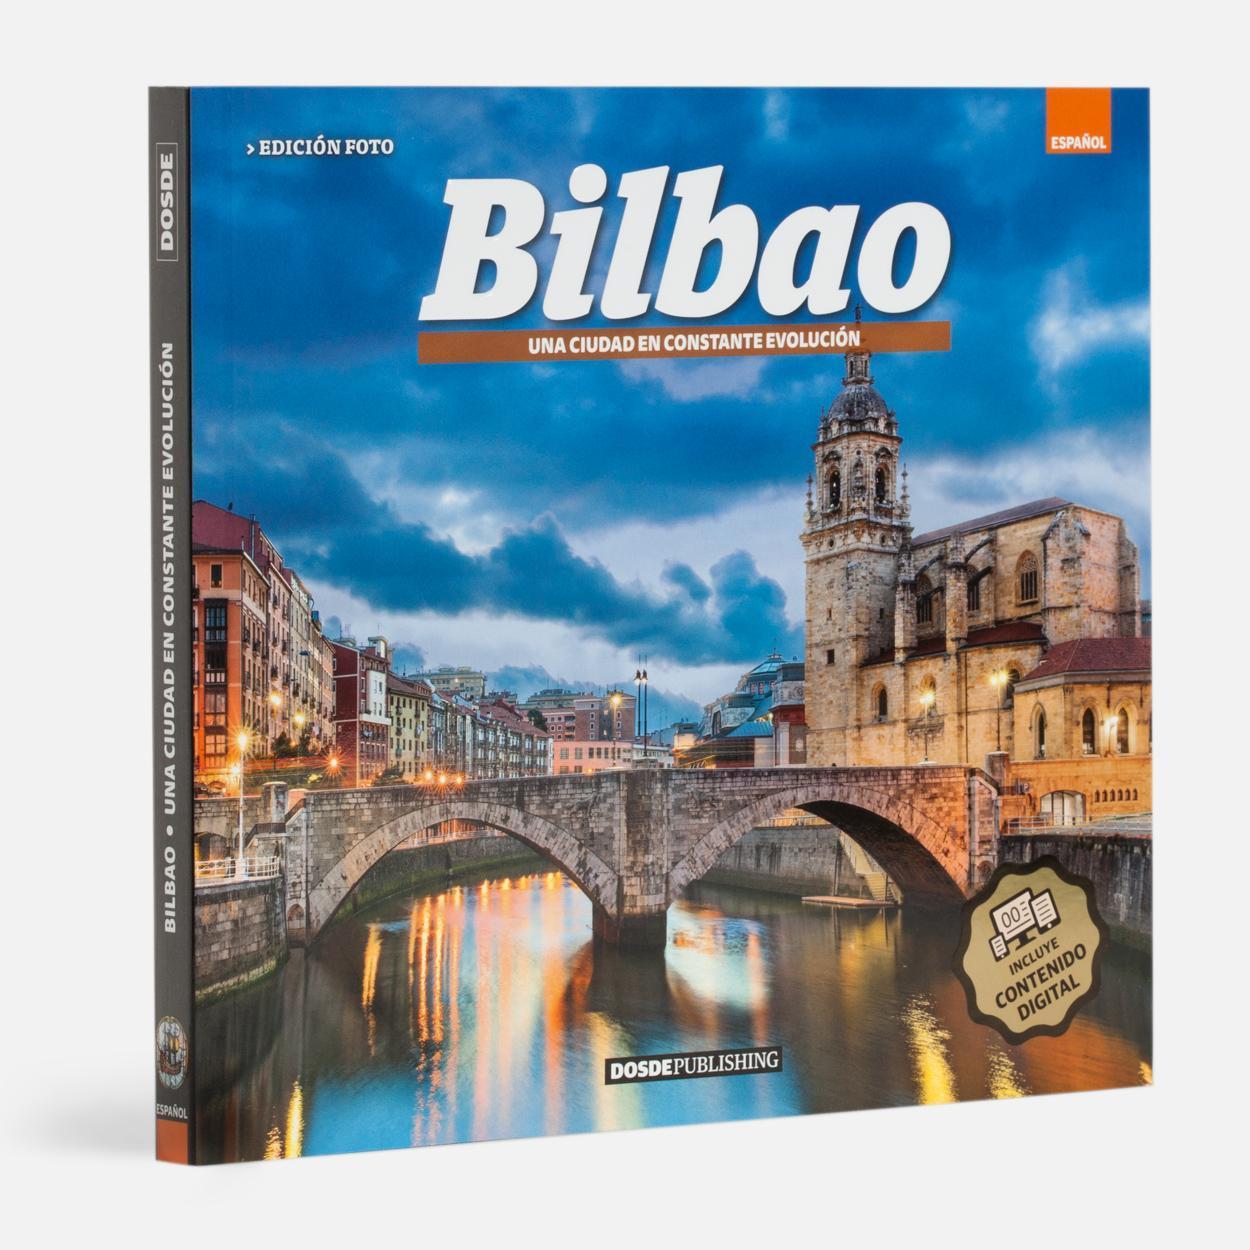 Bilbao Guide